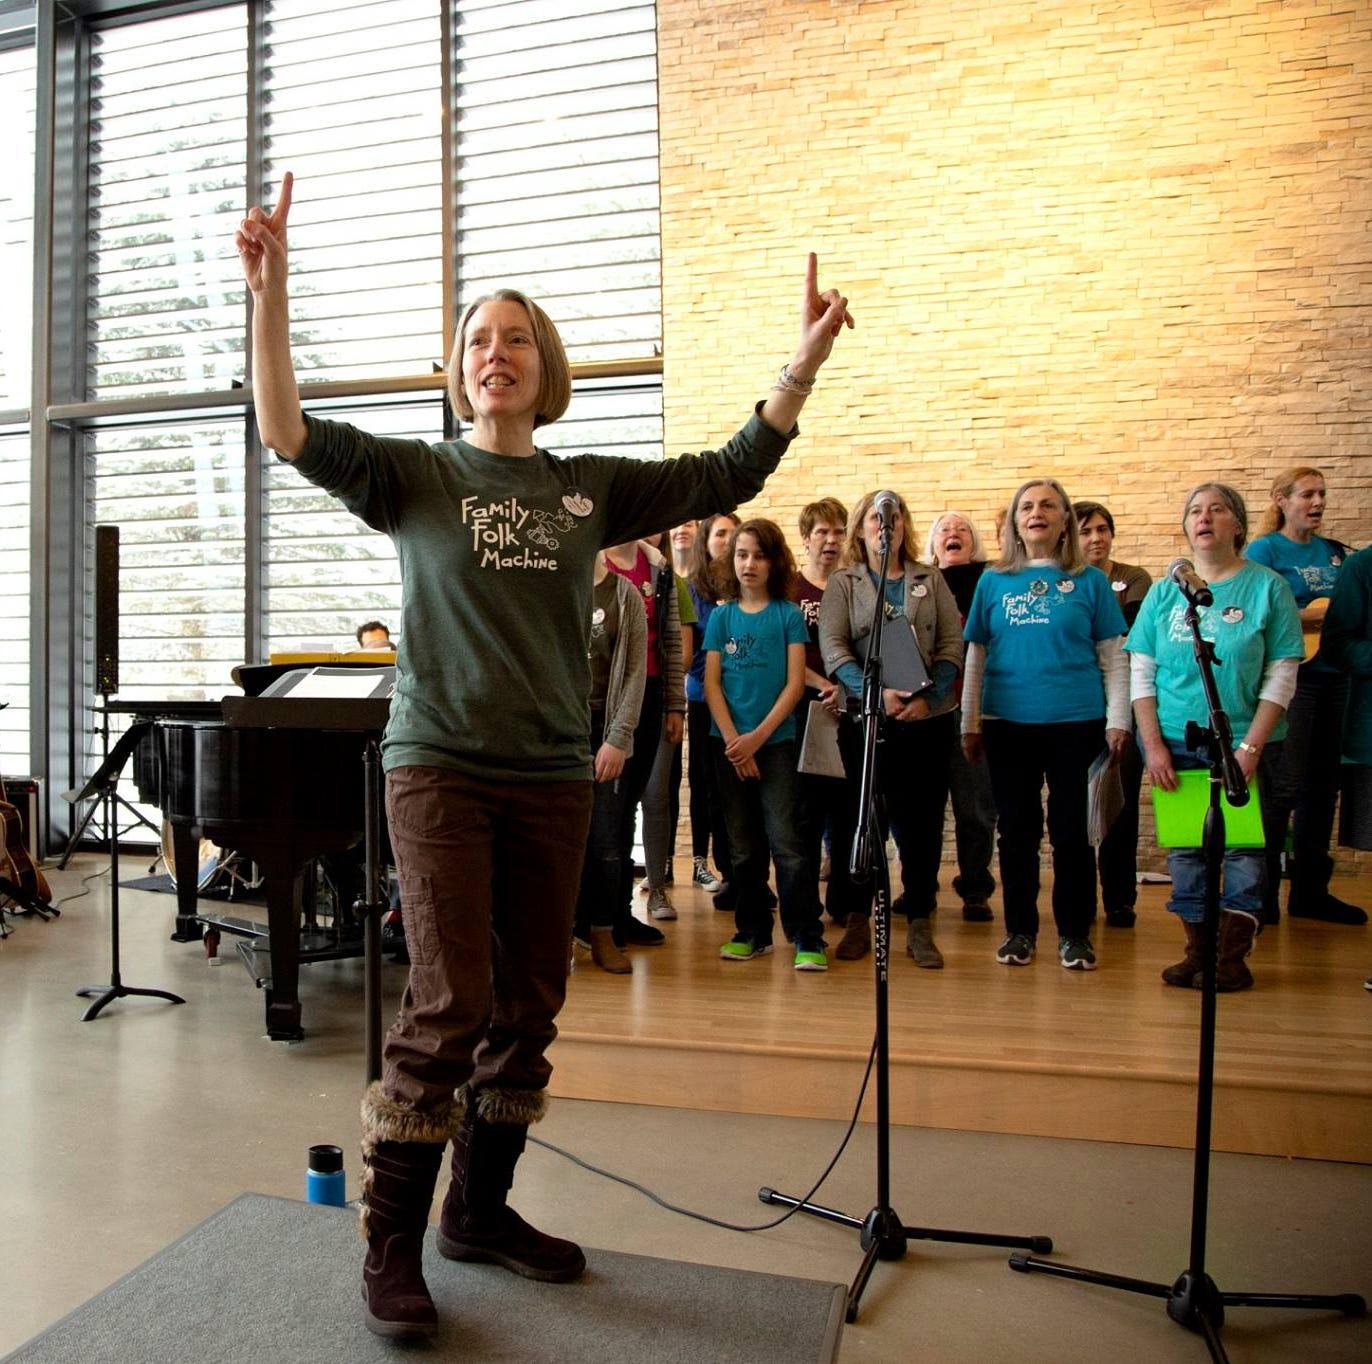 Family Folk Machine performance set to brighten community